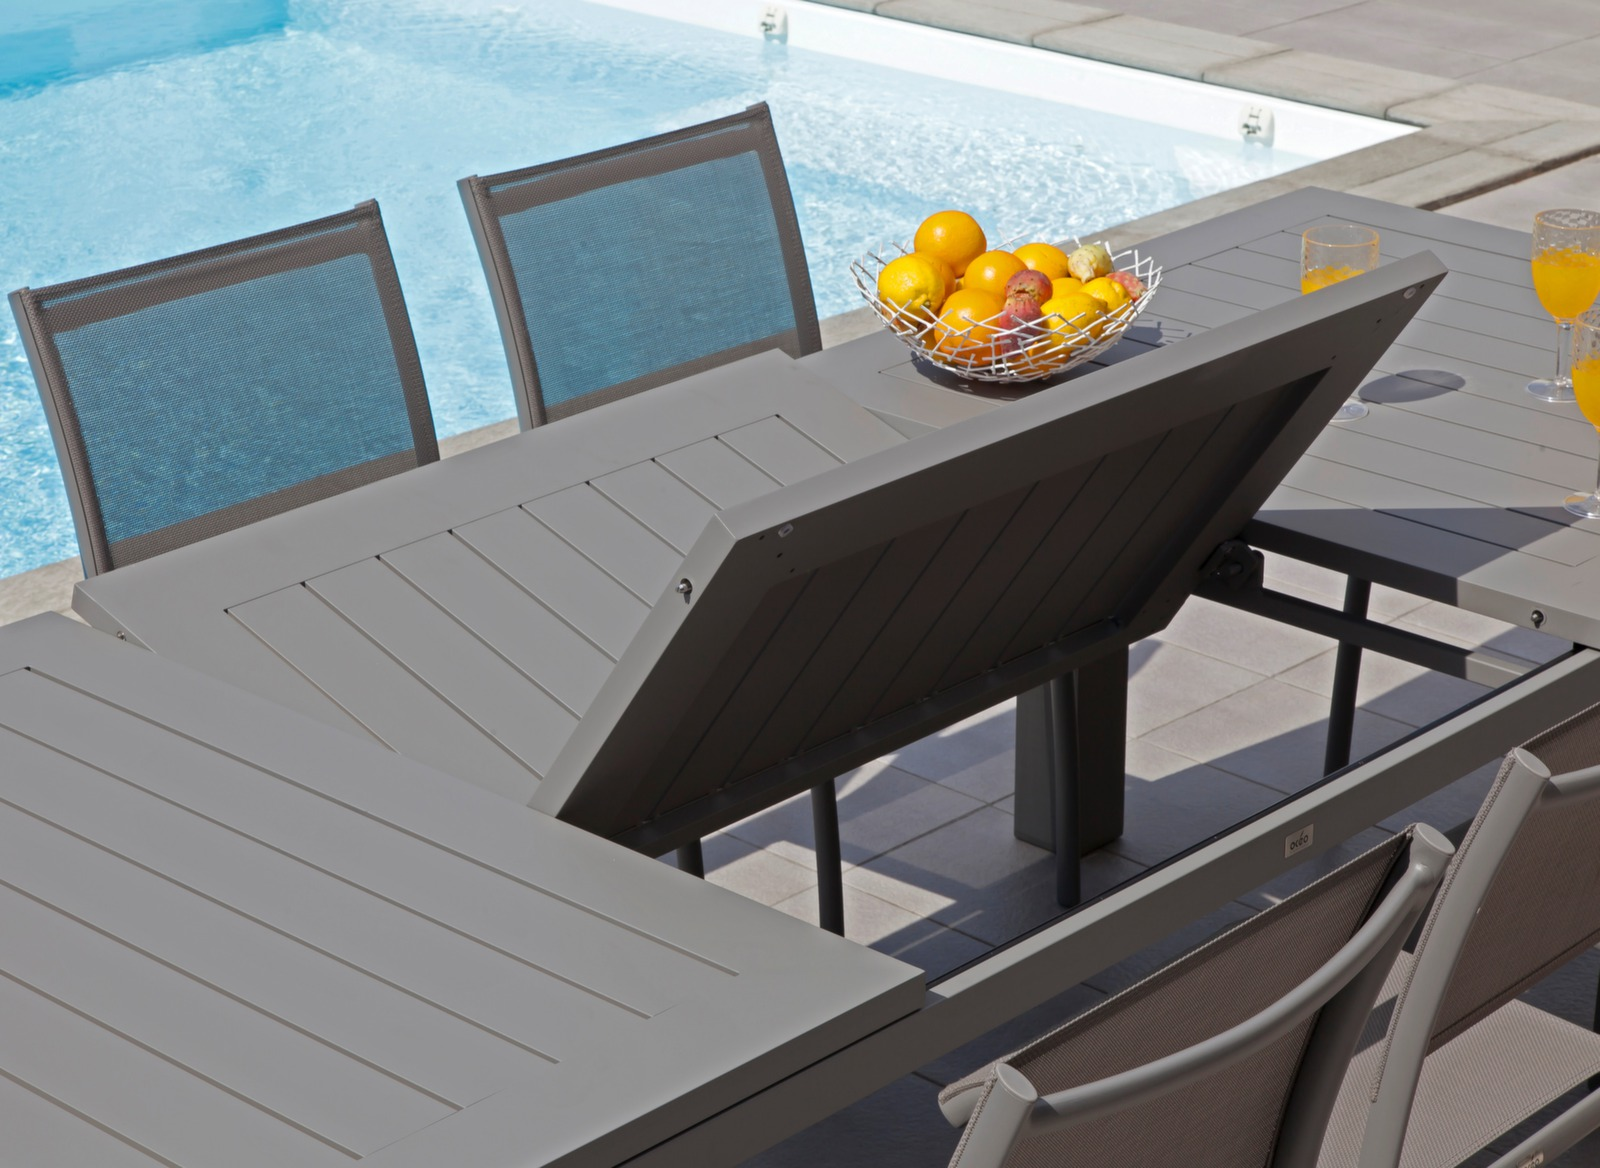 Table de jardin aluminium 12 places Aurore - Gamme Océo - Proloisirs